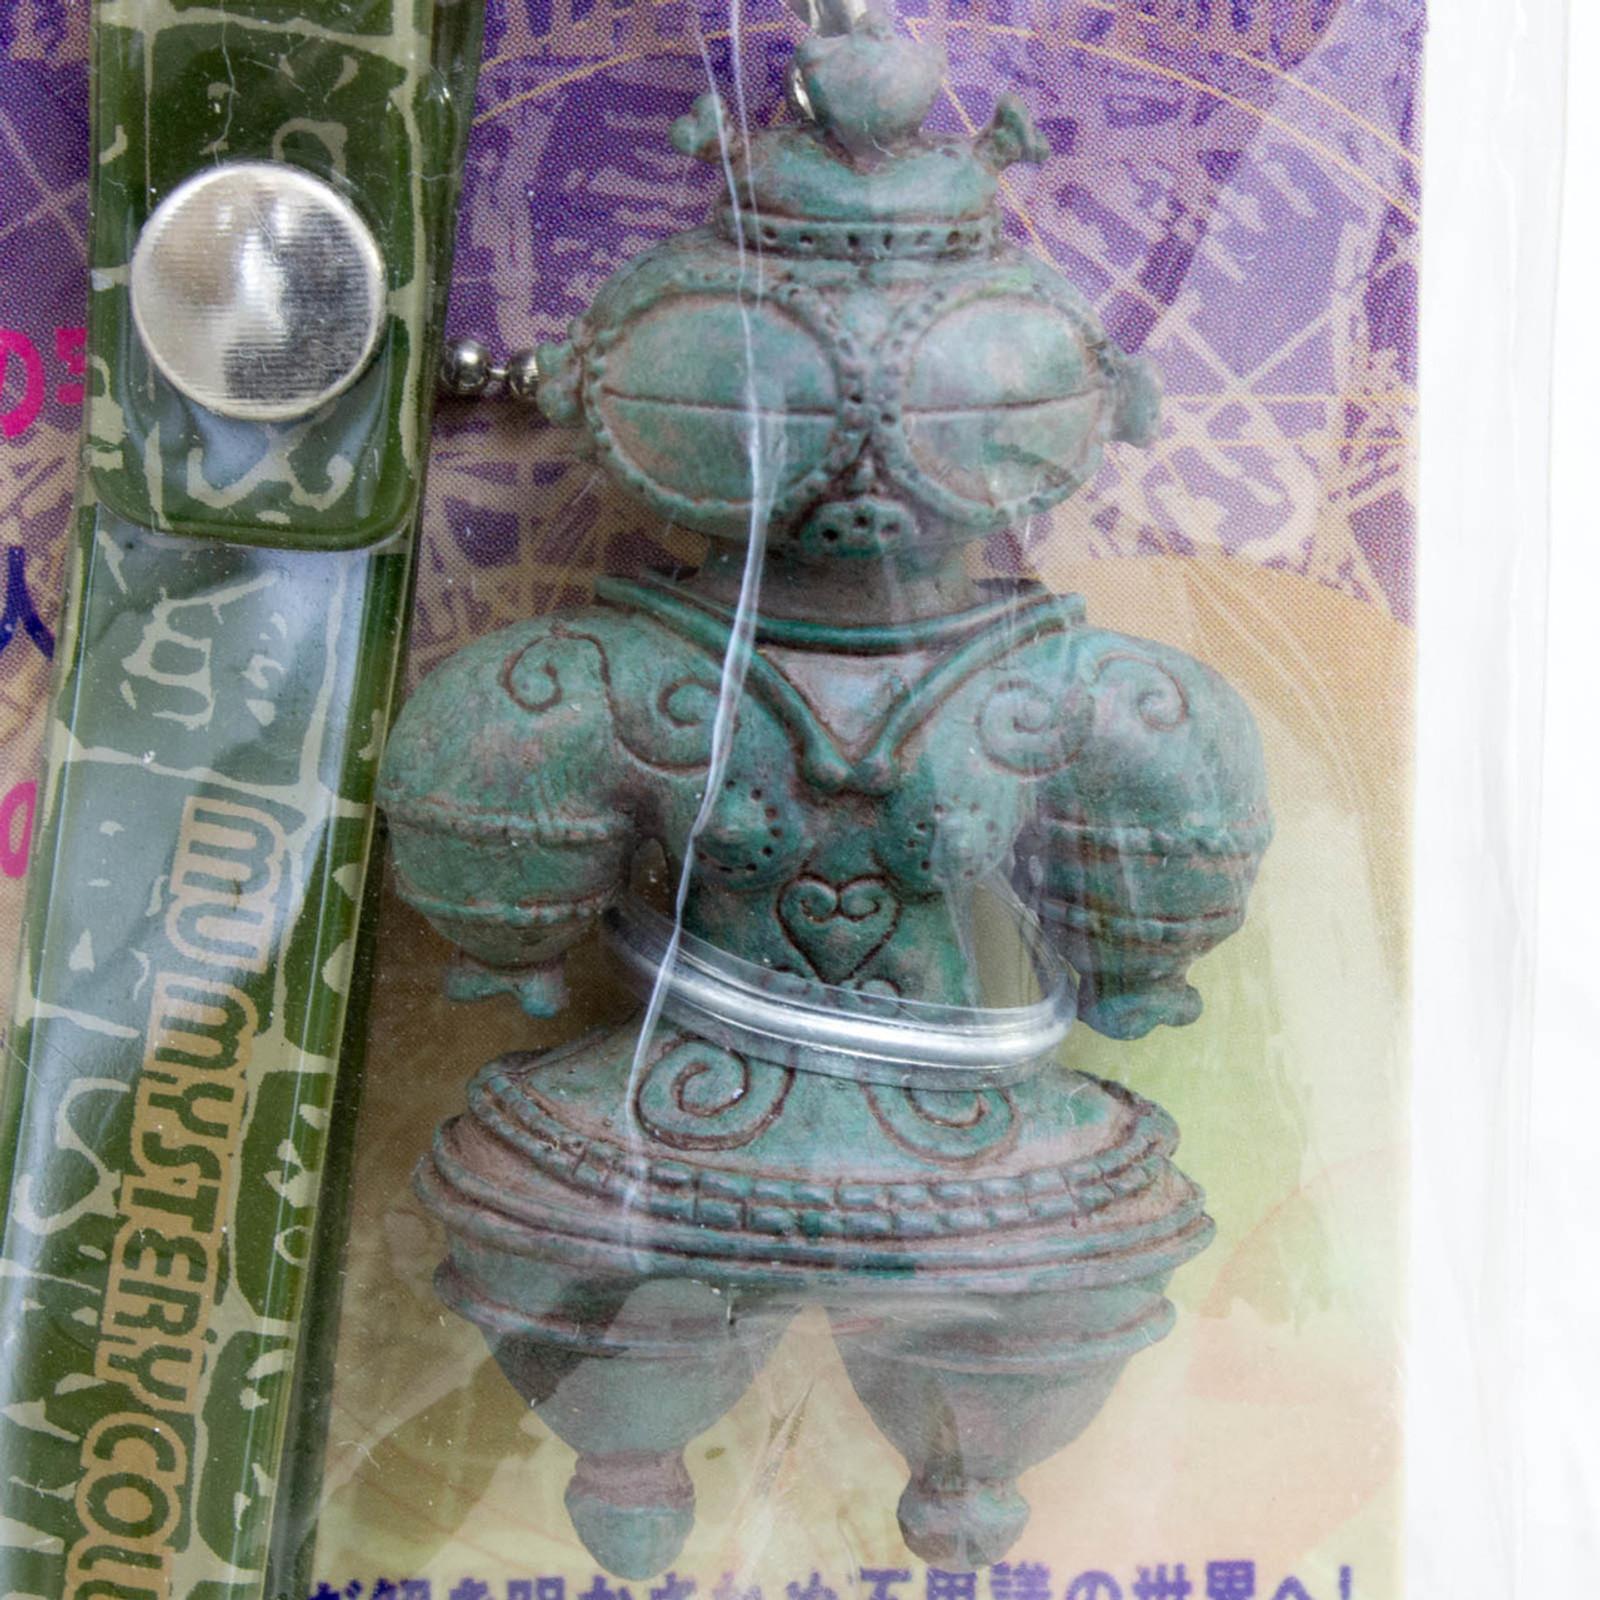 RARE! Spaceman Clay Figurine Strap Super Mystery Magazine MU Goods JAPAN SEGA